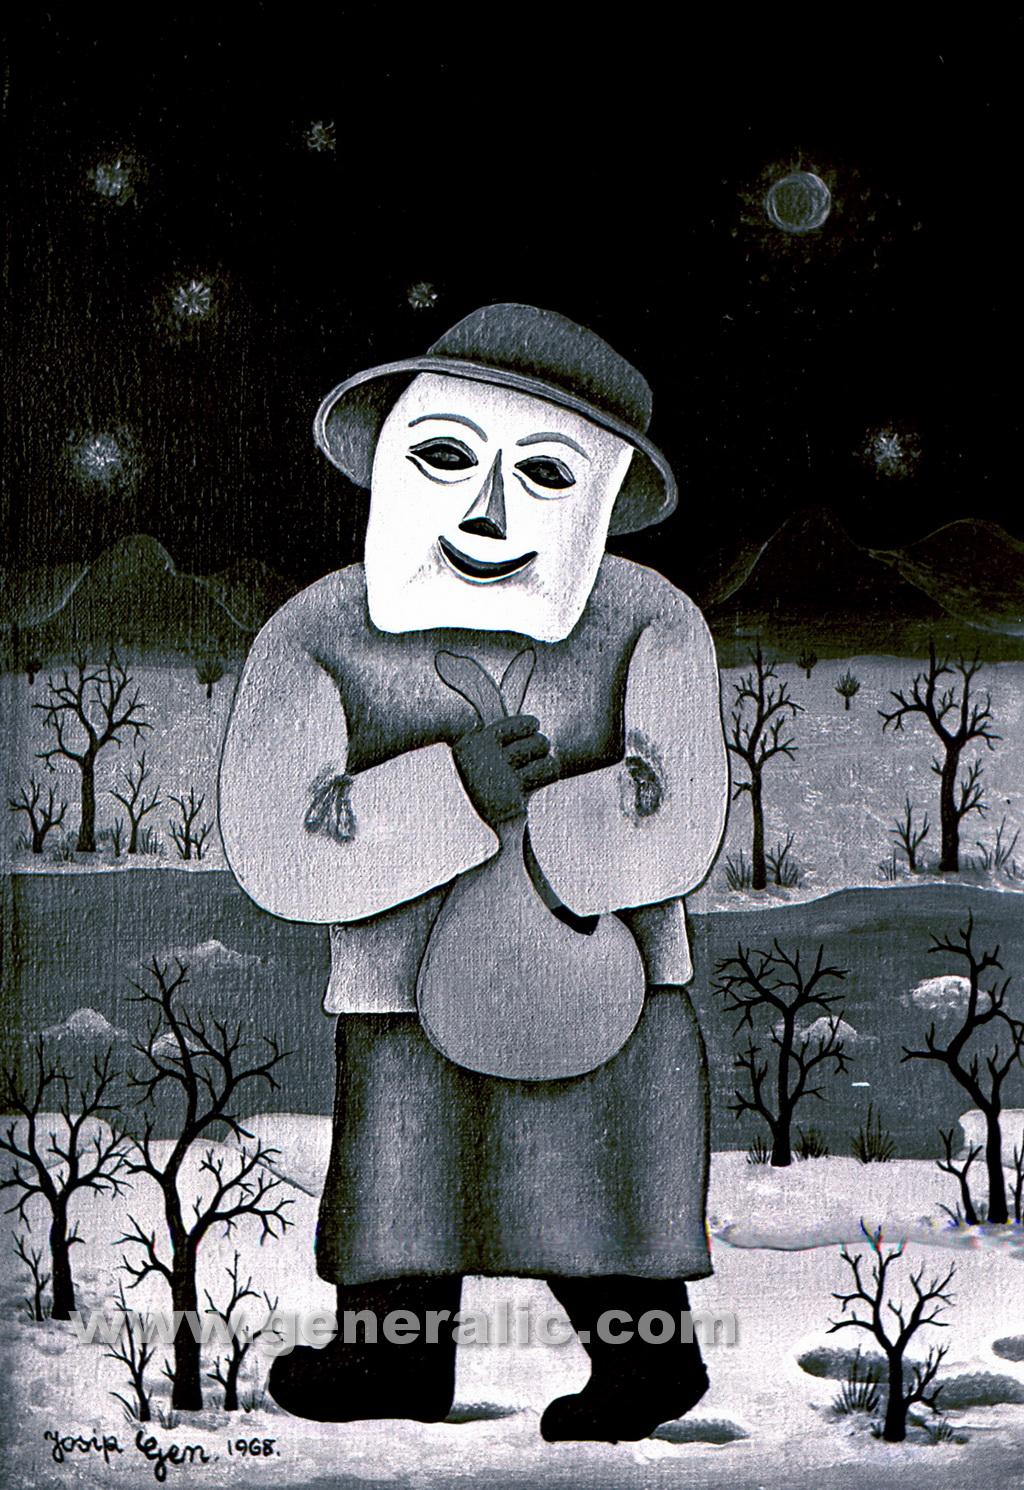 Josip Generalic, 1968, Masquerade, oil on canvas